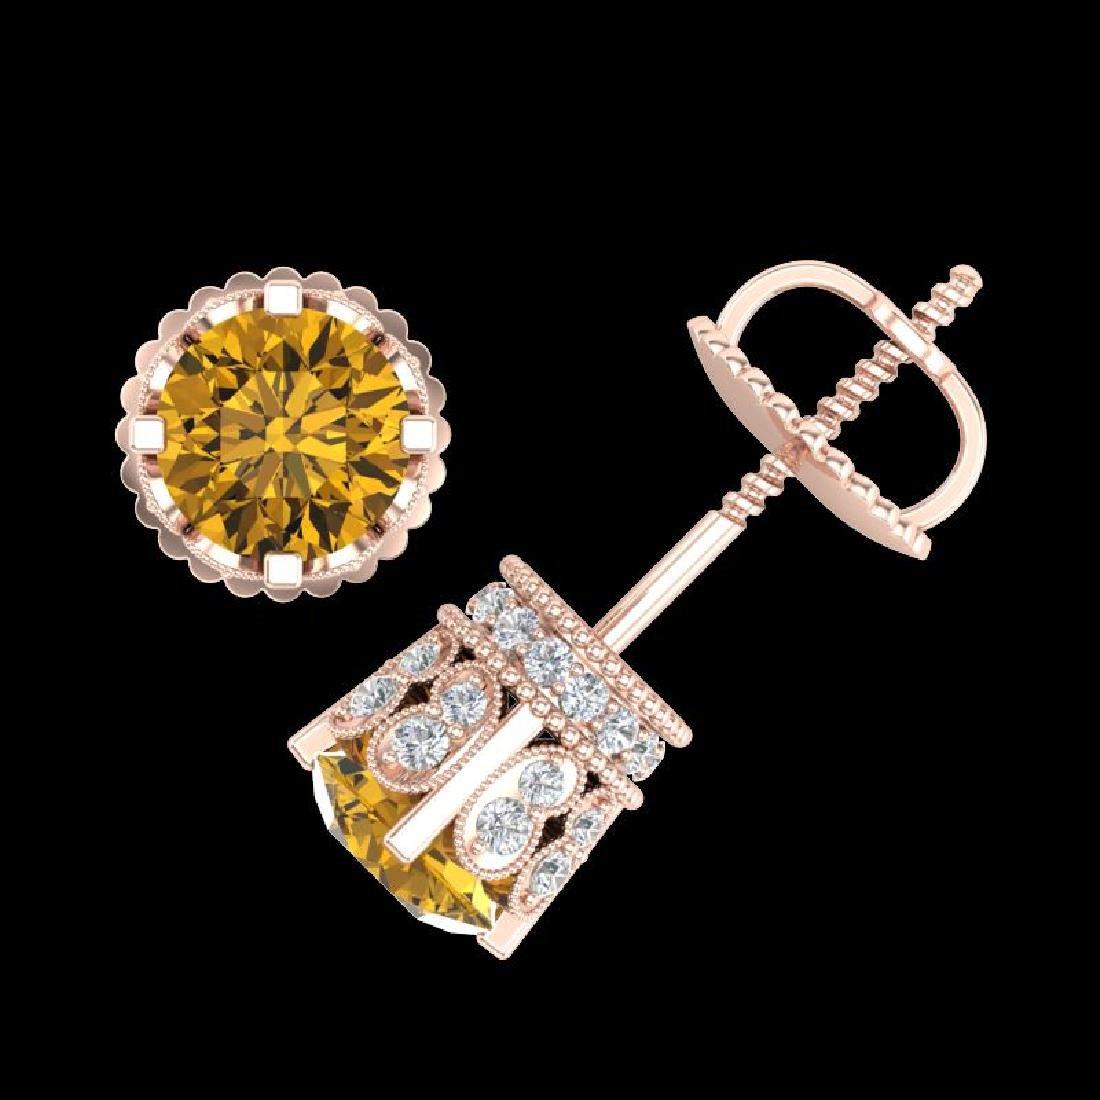 3 CTW Intense Fancy Yellow Diamond Art Deco Stud - 3